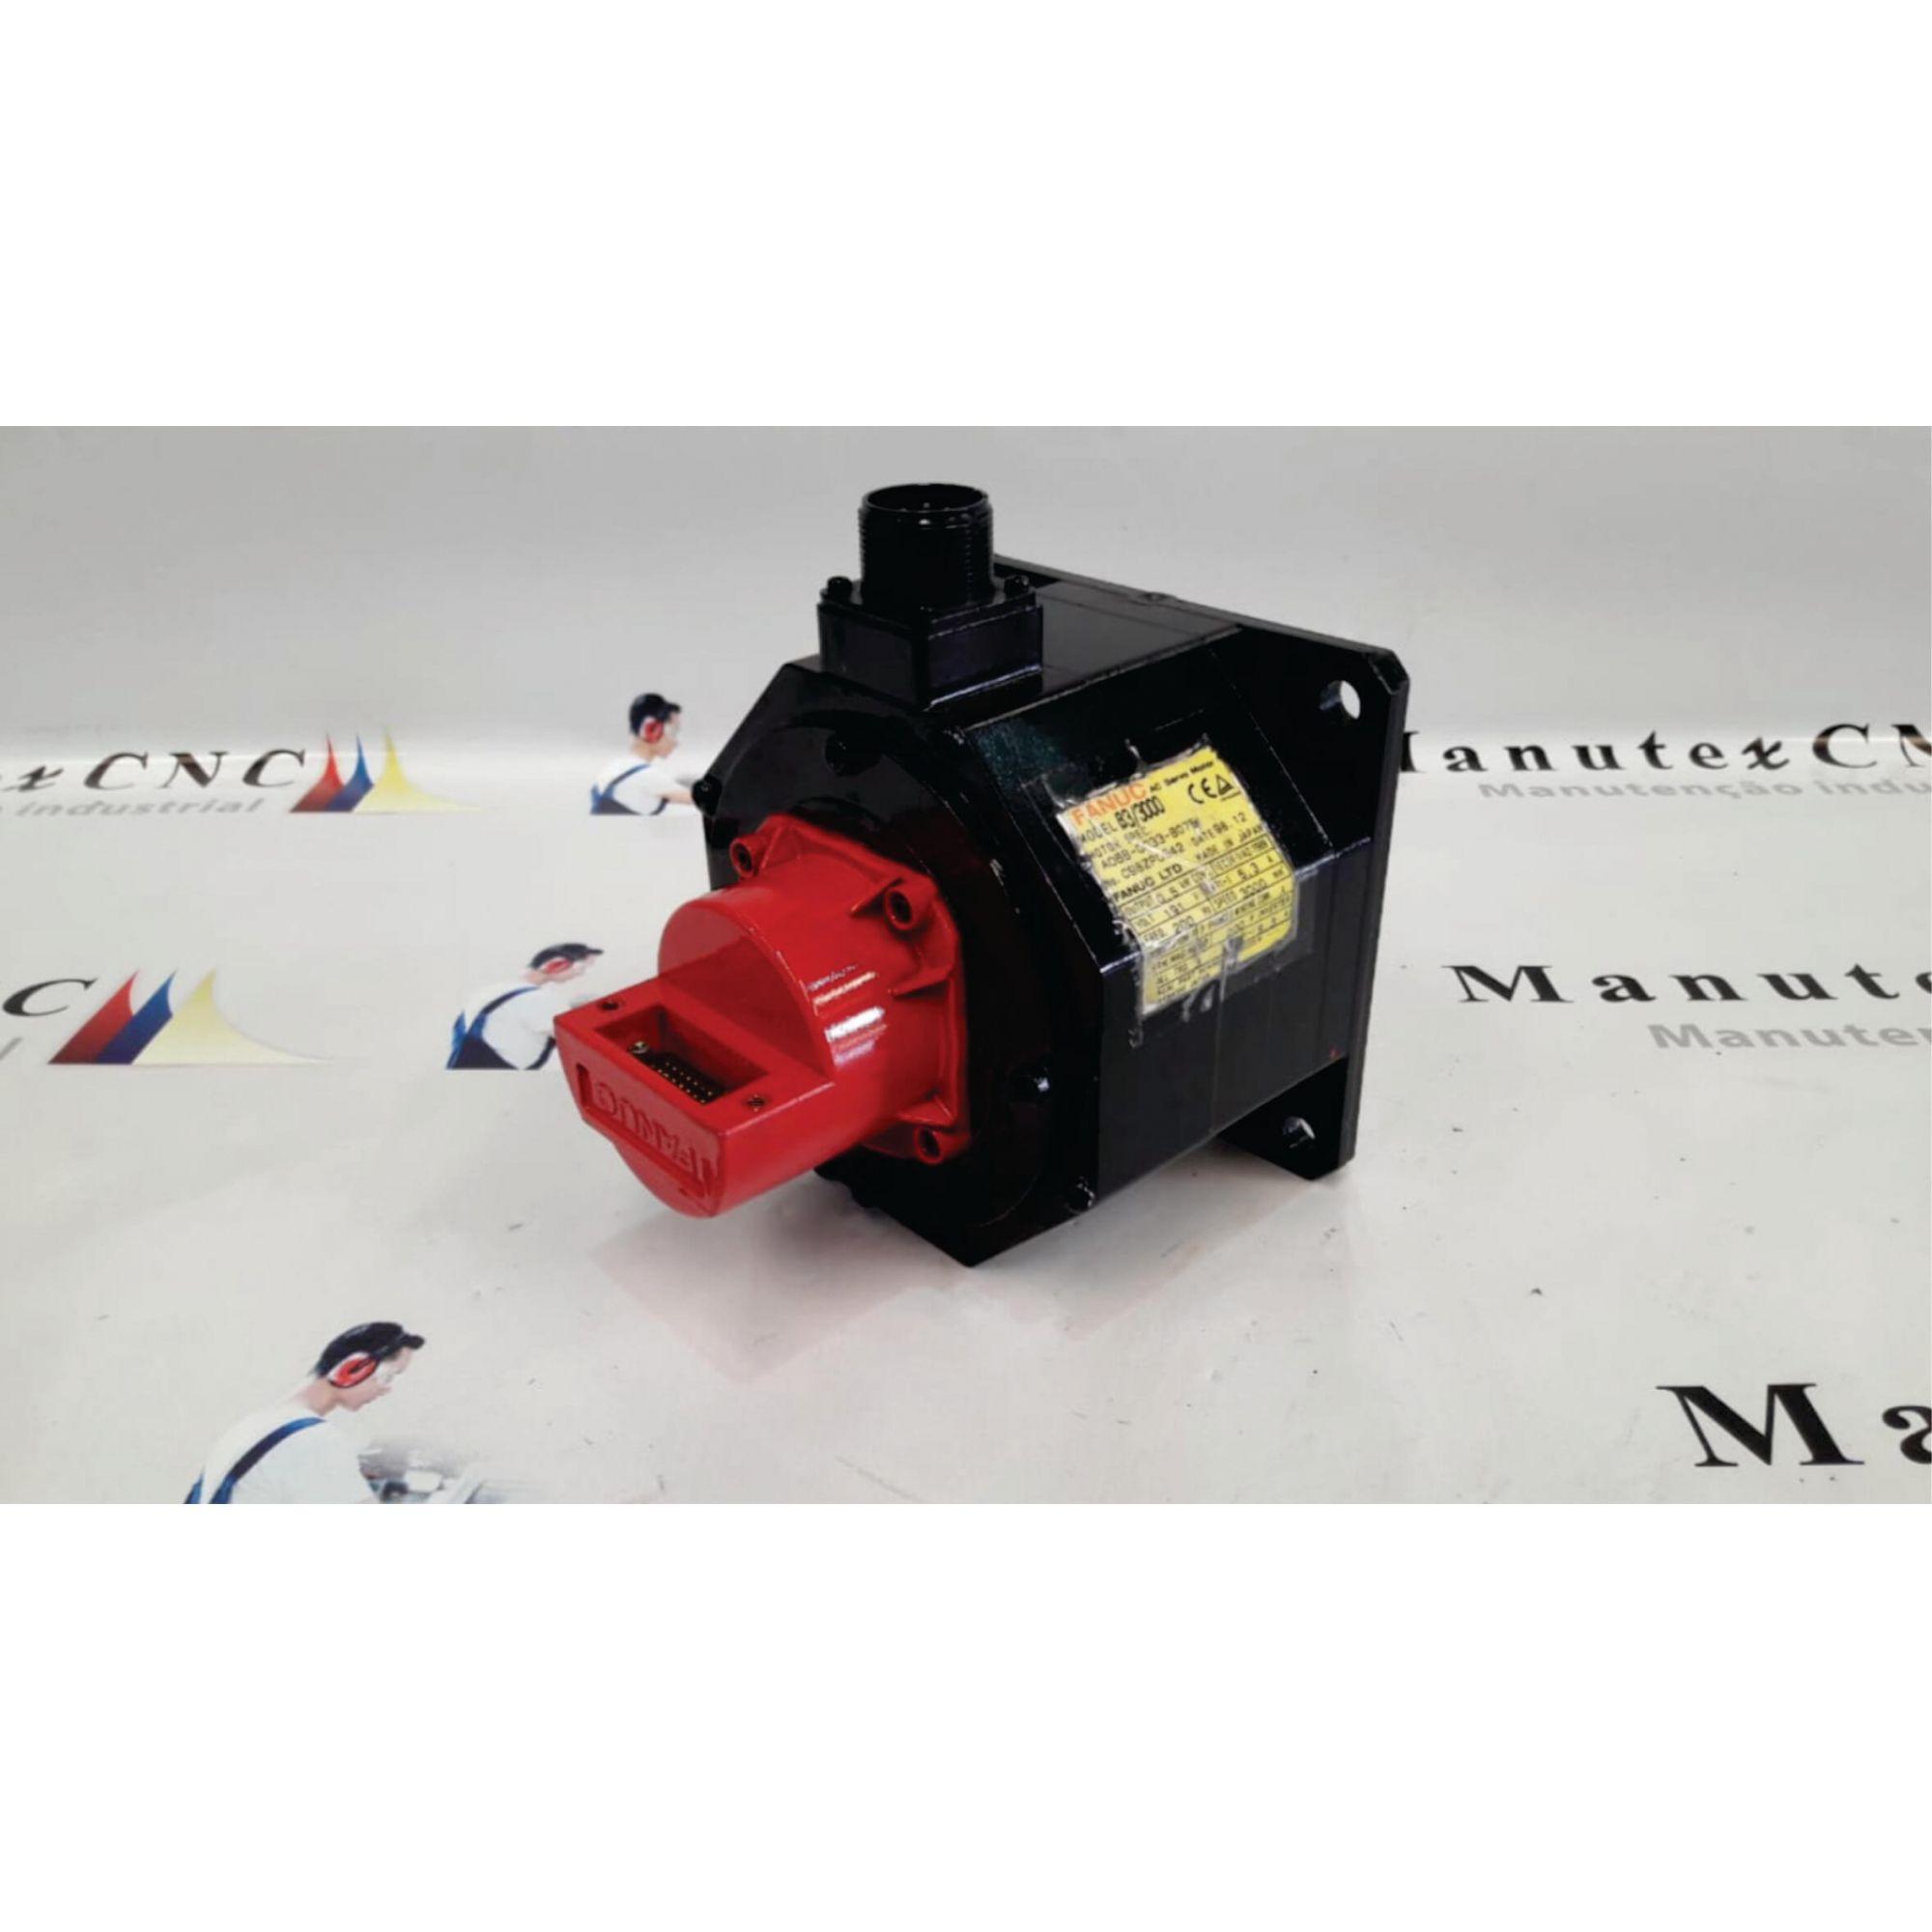 A06B-0033-B075 | SERVO MOTOR | FANUC